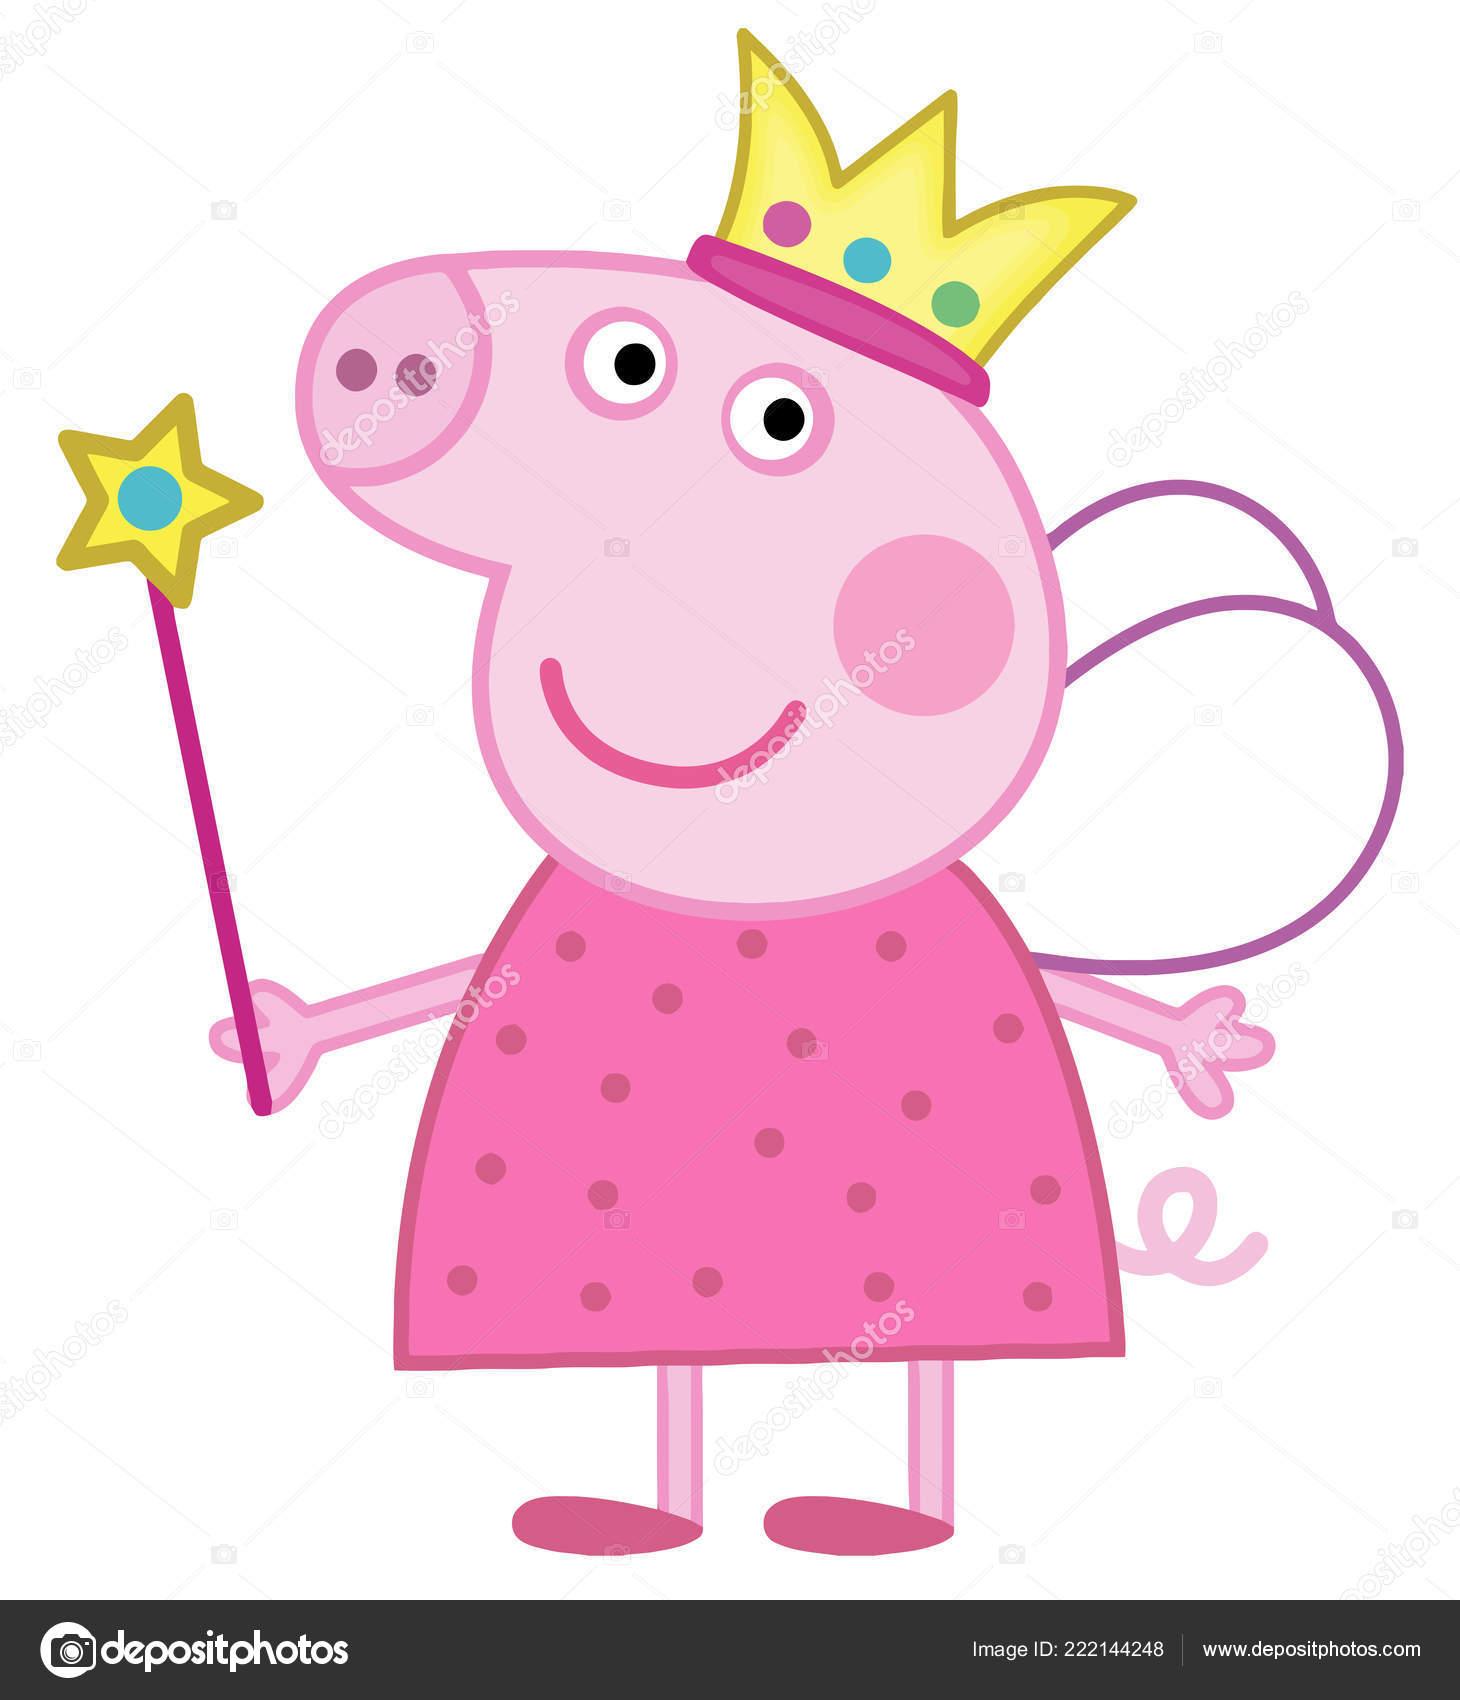 Images Peppa Pig Characters Peppa Pig Kids Cartoon Character Fairy Illustration Stock Editorial Photo C Chutimakuanamon 222144248